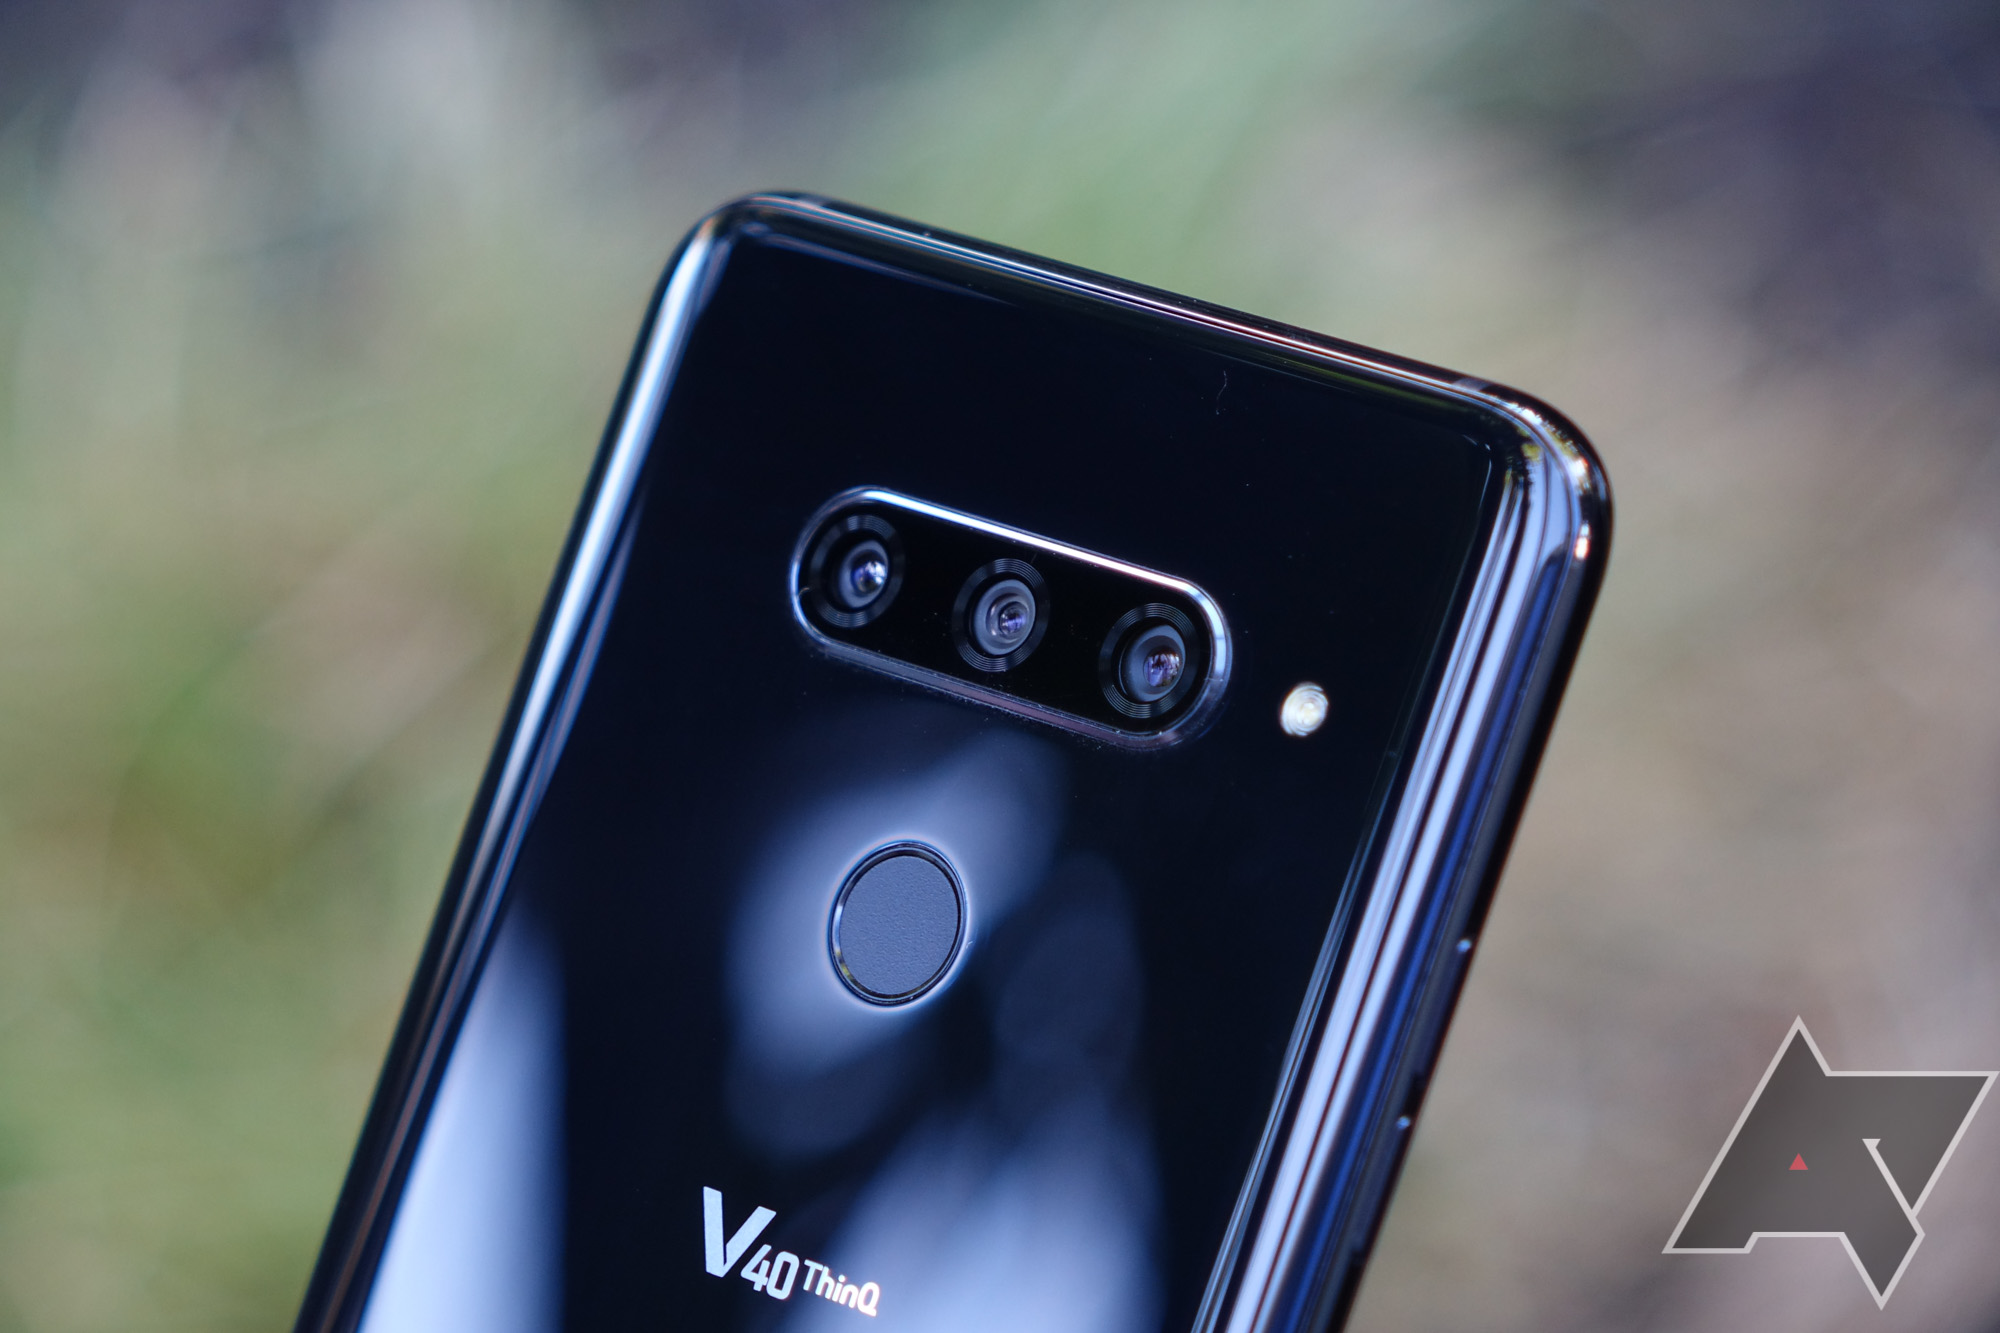 LG V40 review: The best LG's ever built still isn't quite enough